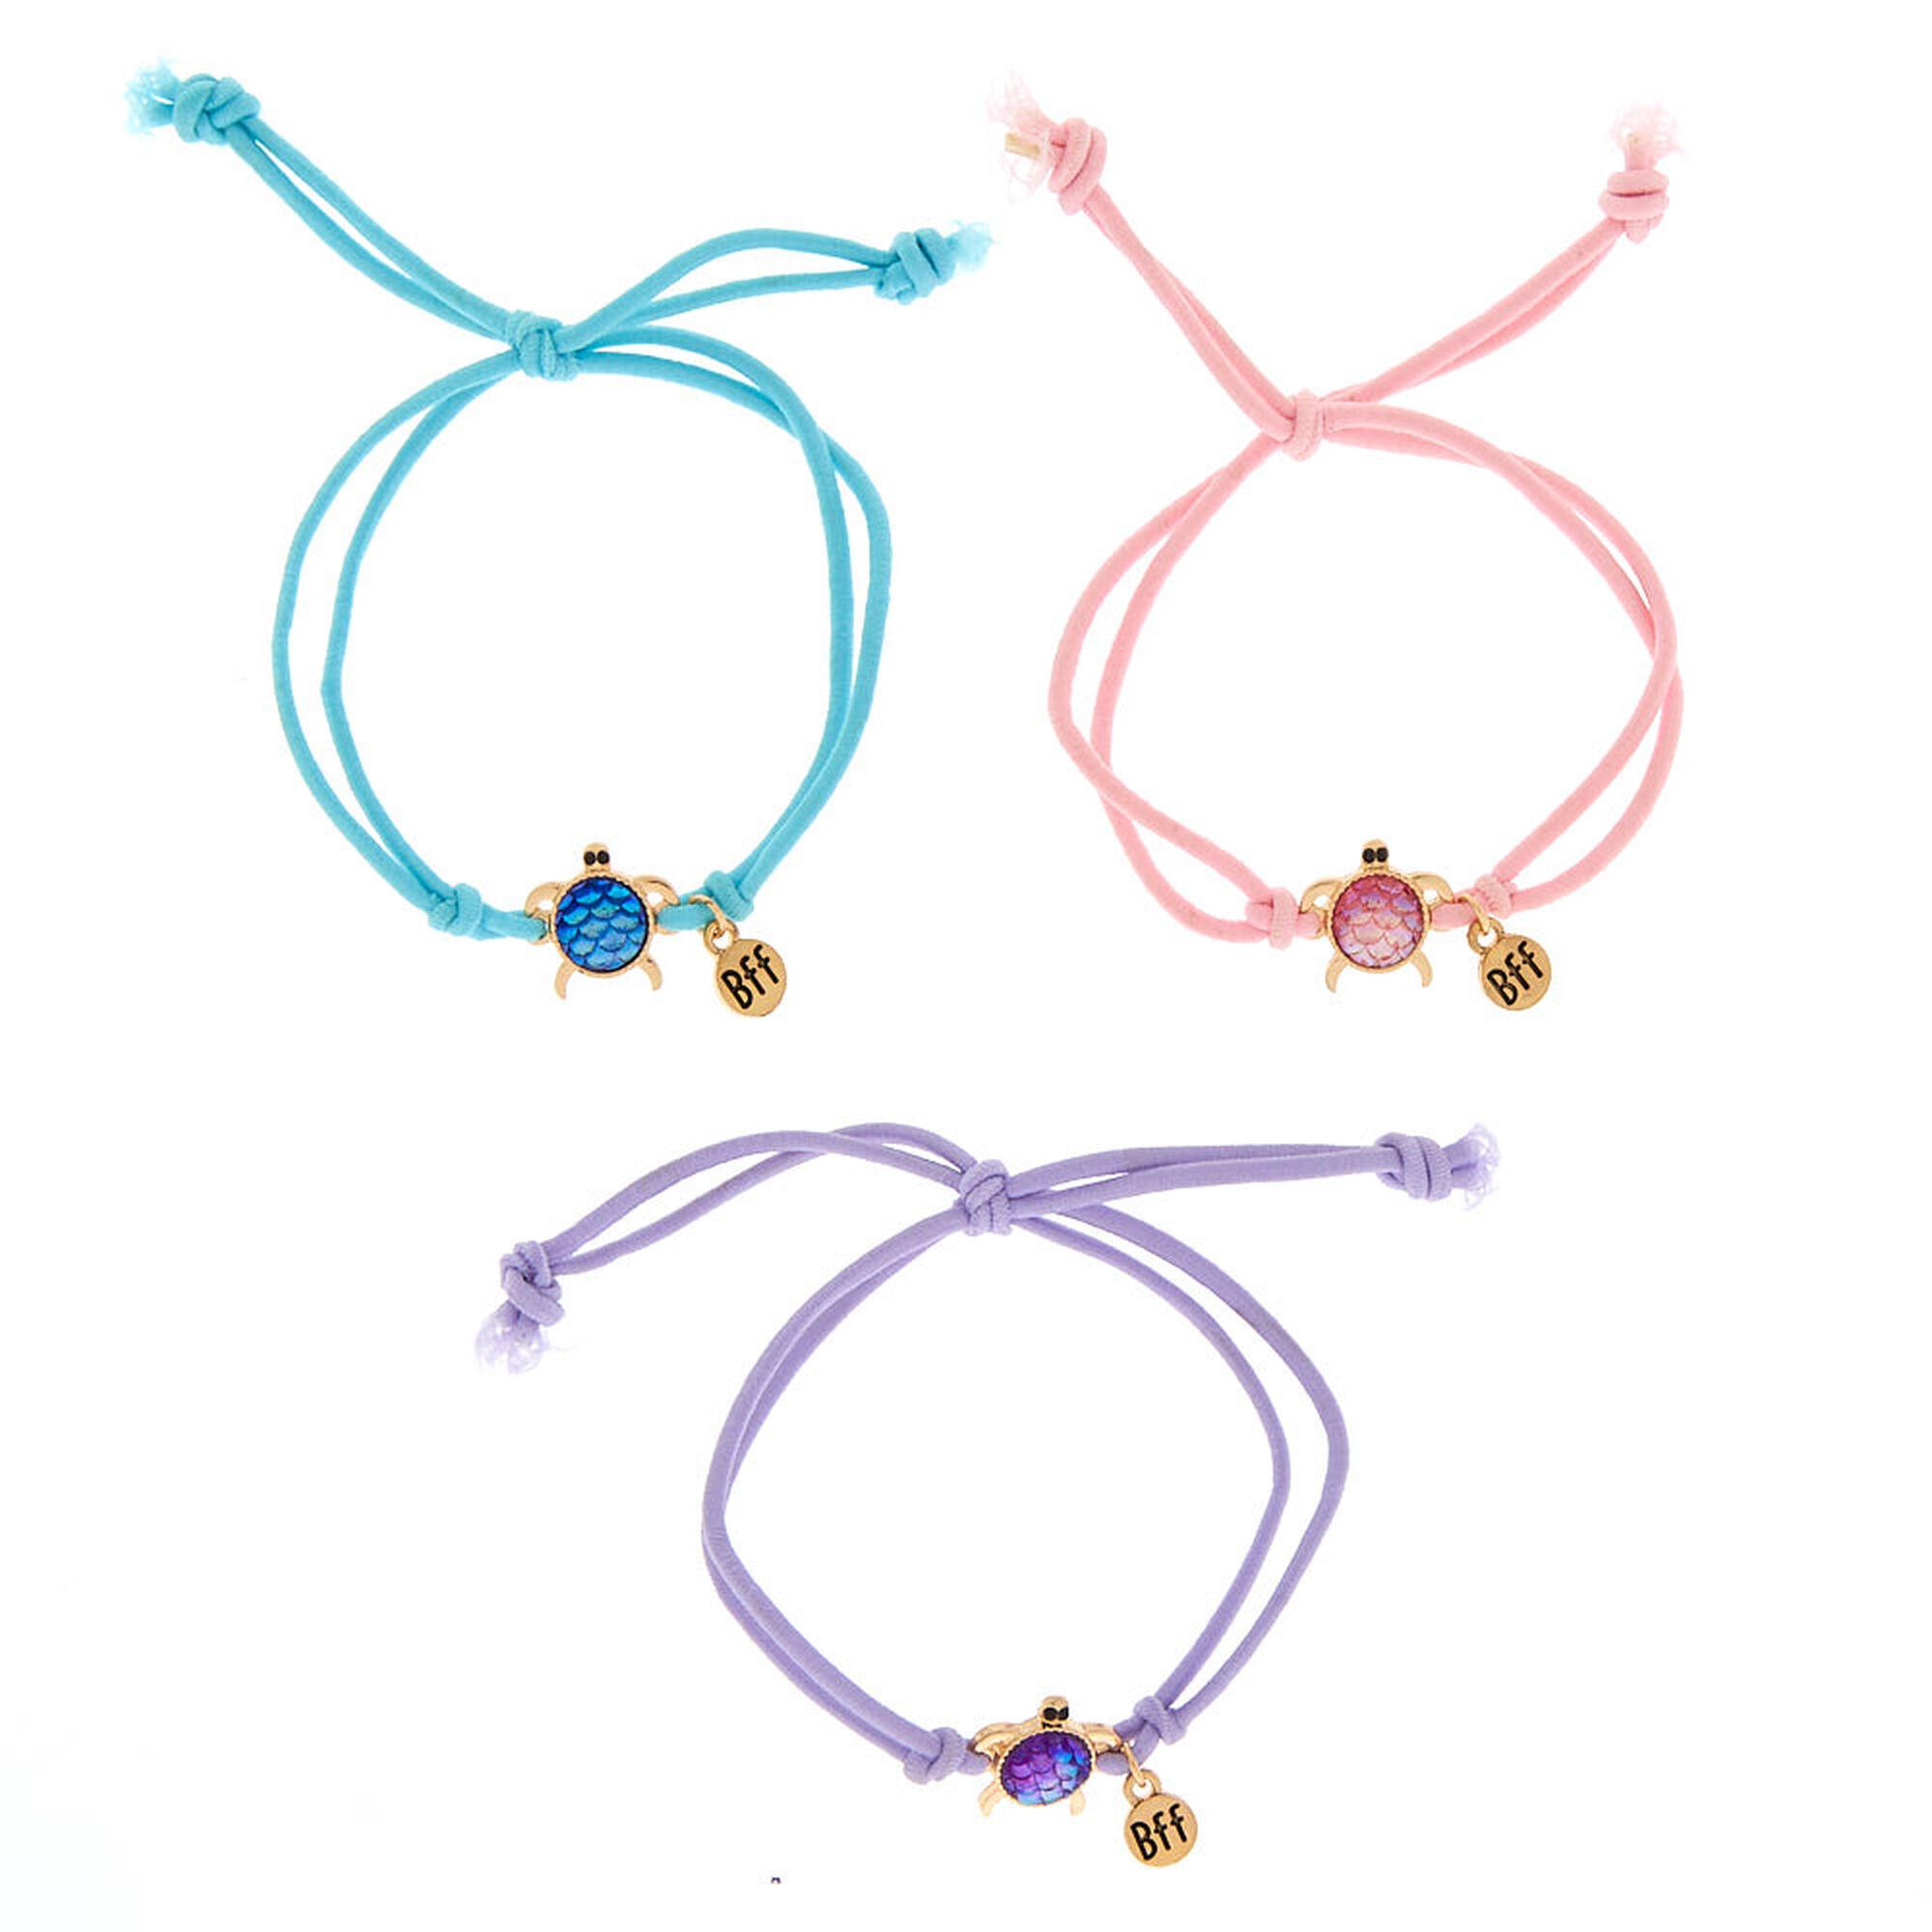 6a4fe65ff3ee6 Pastel Turtle Stretch Friendship Bracelets - 3 Pack